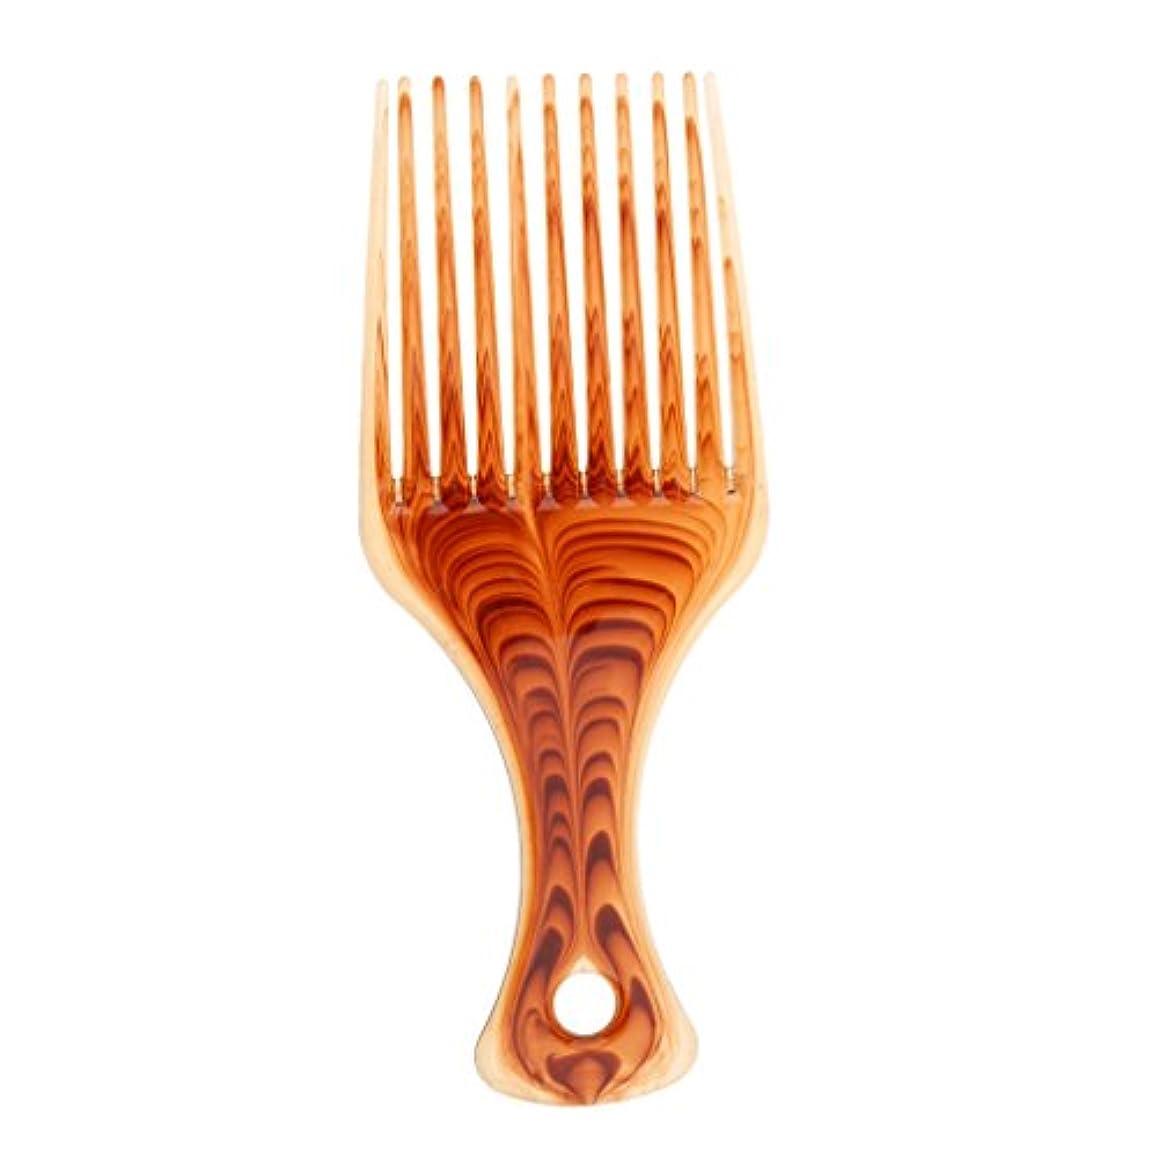 Baosity ヘアブラシ ヘアコーム くし プラスチック製 アフロ 髪の櫛 持ち上げ ヘアブラシ